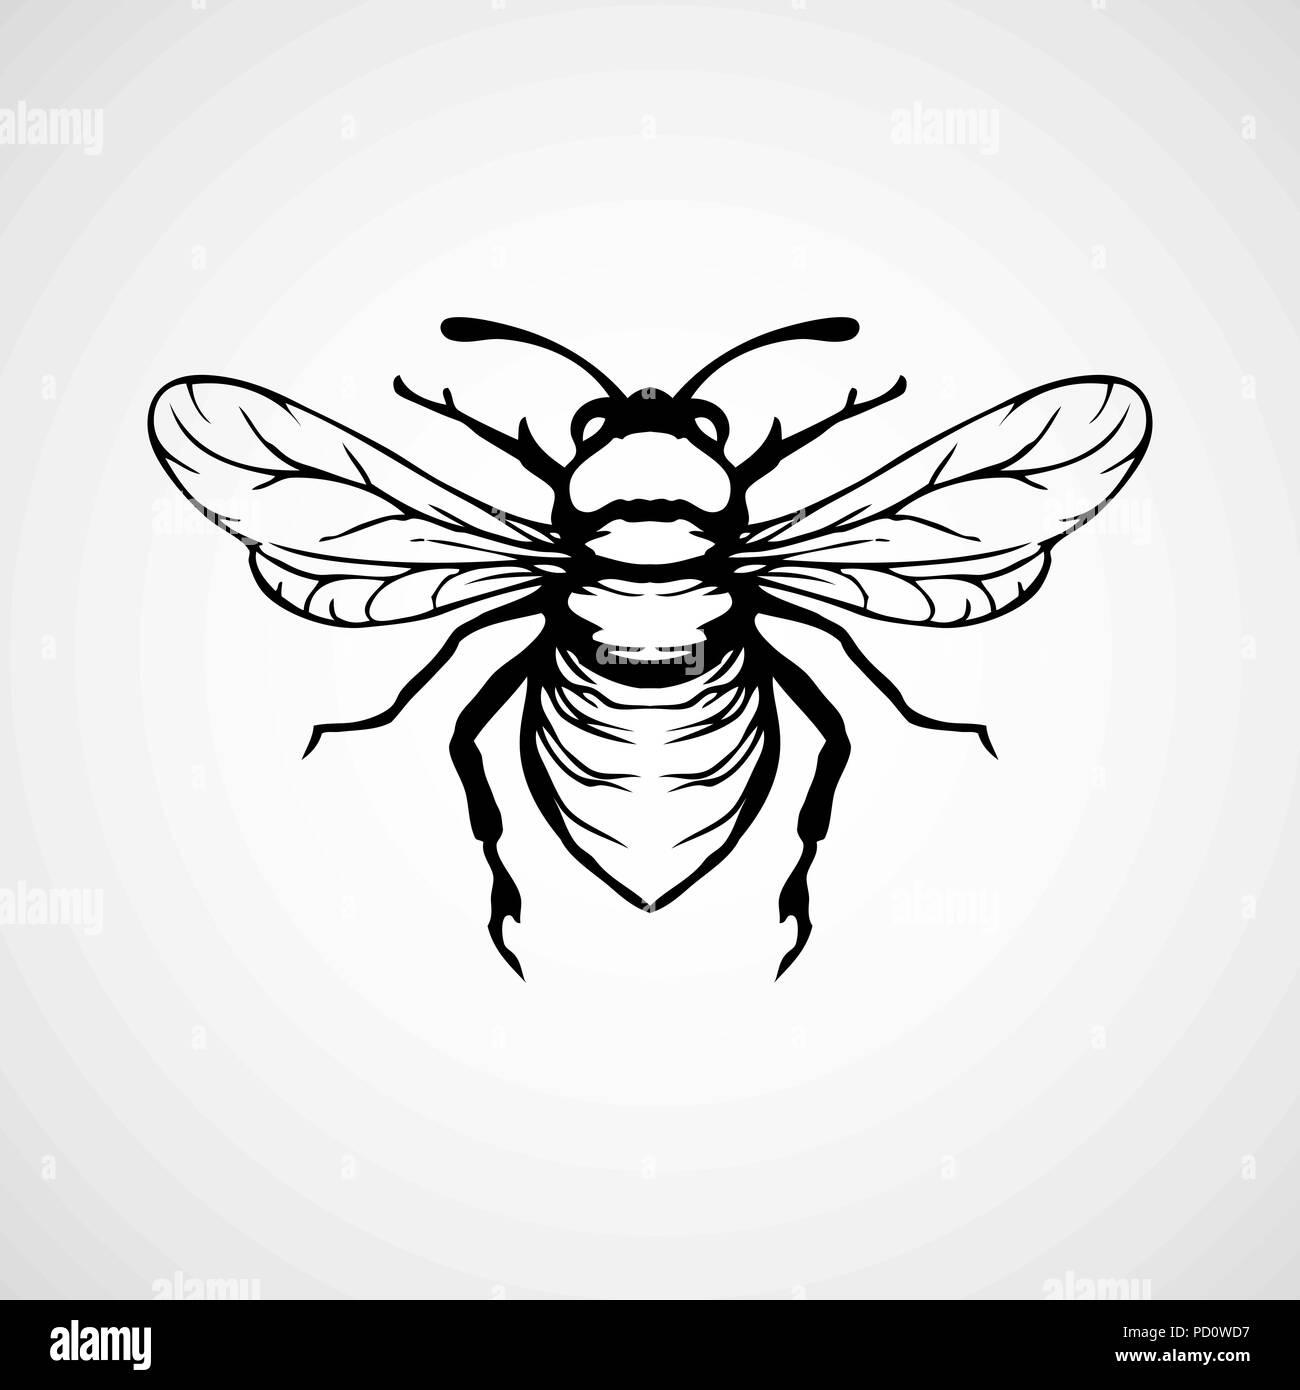 Vector engraving illustration of honey bee on white background - Stock Vector